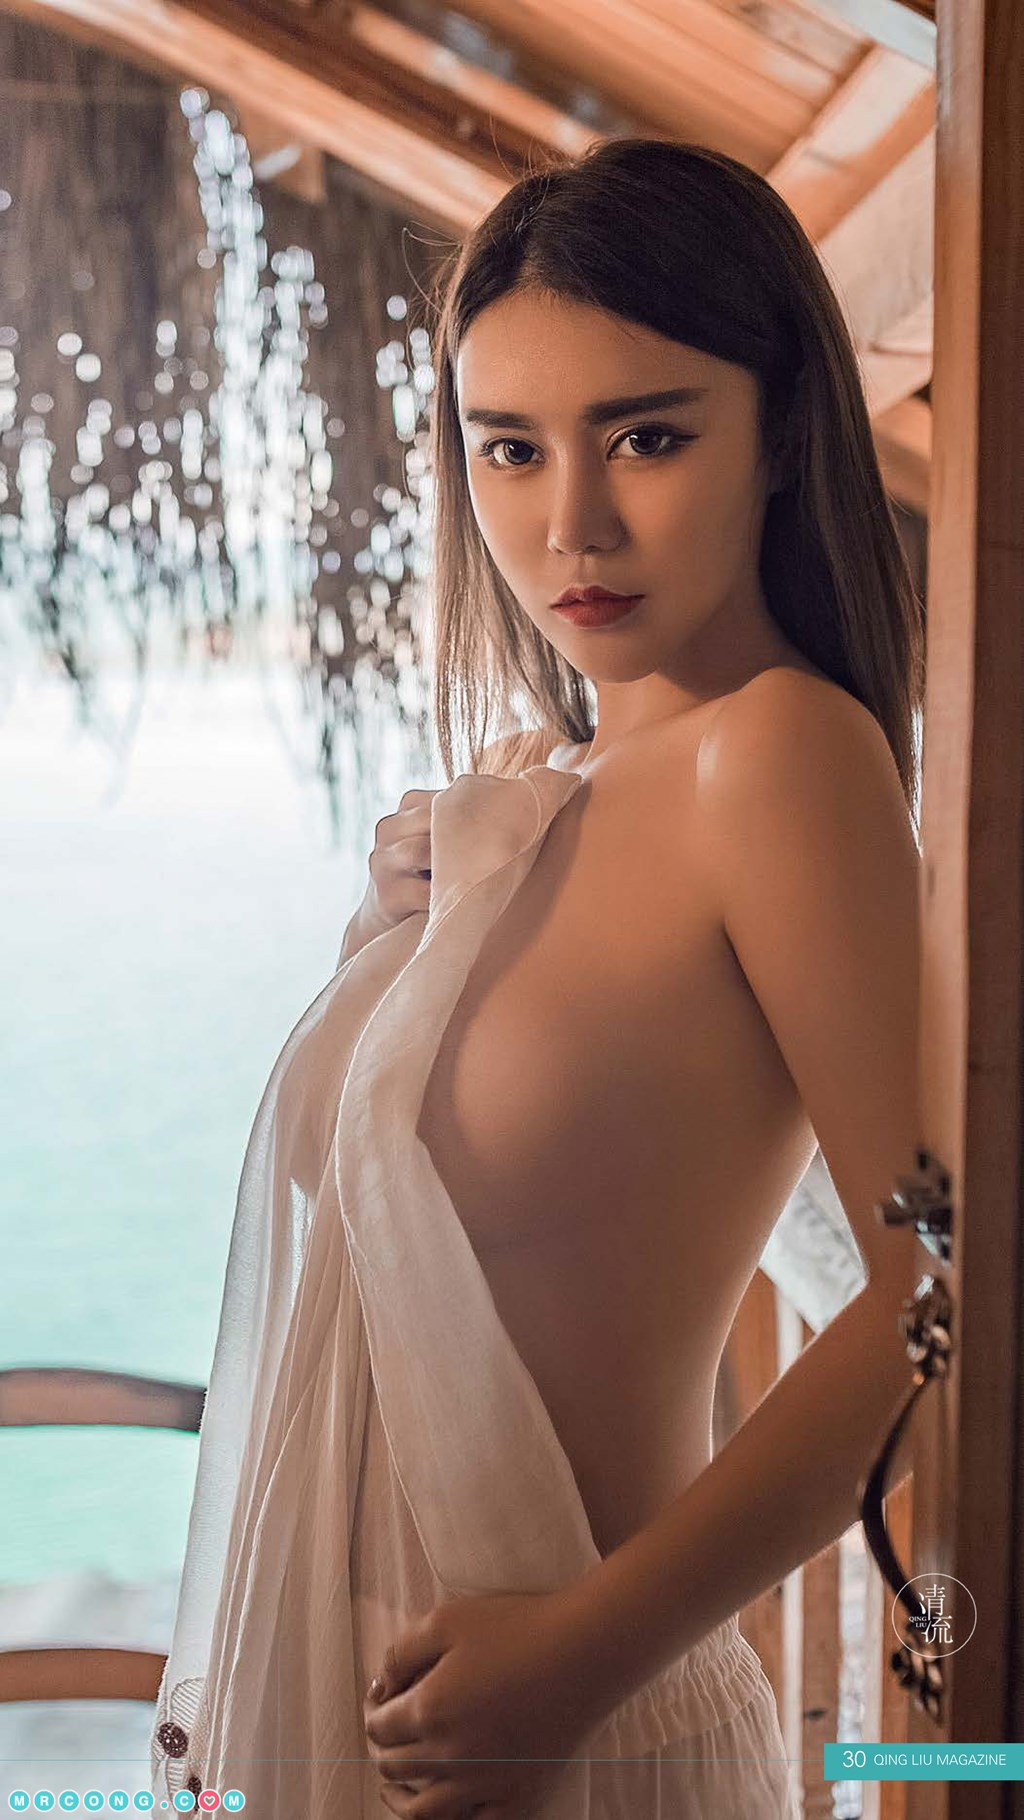 Image Qing-Liu-Magazine-2017-10-01-MrCong.com-033 in post Qing Liu Magazine 2017-10-01 第四期 (78 ảnh)